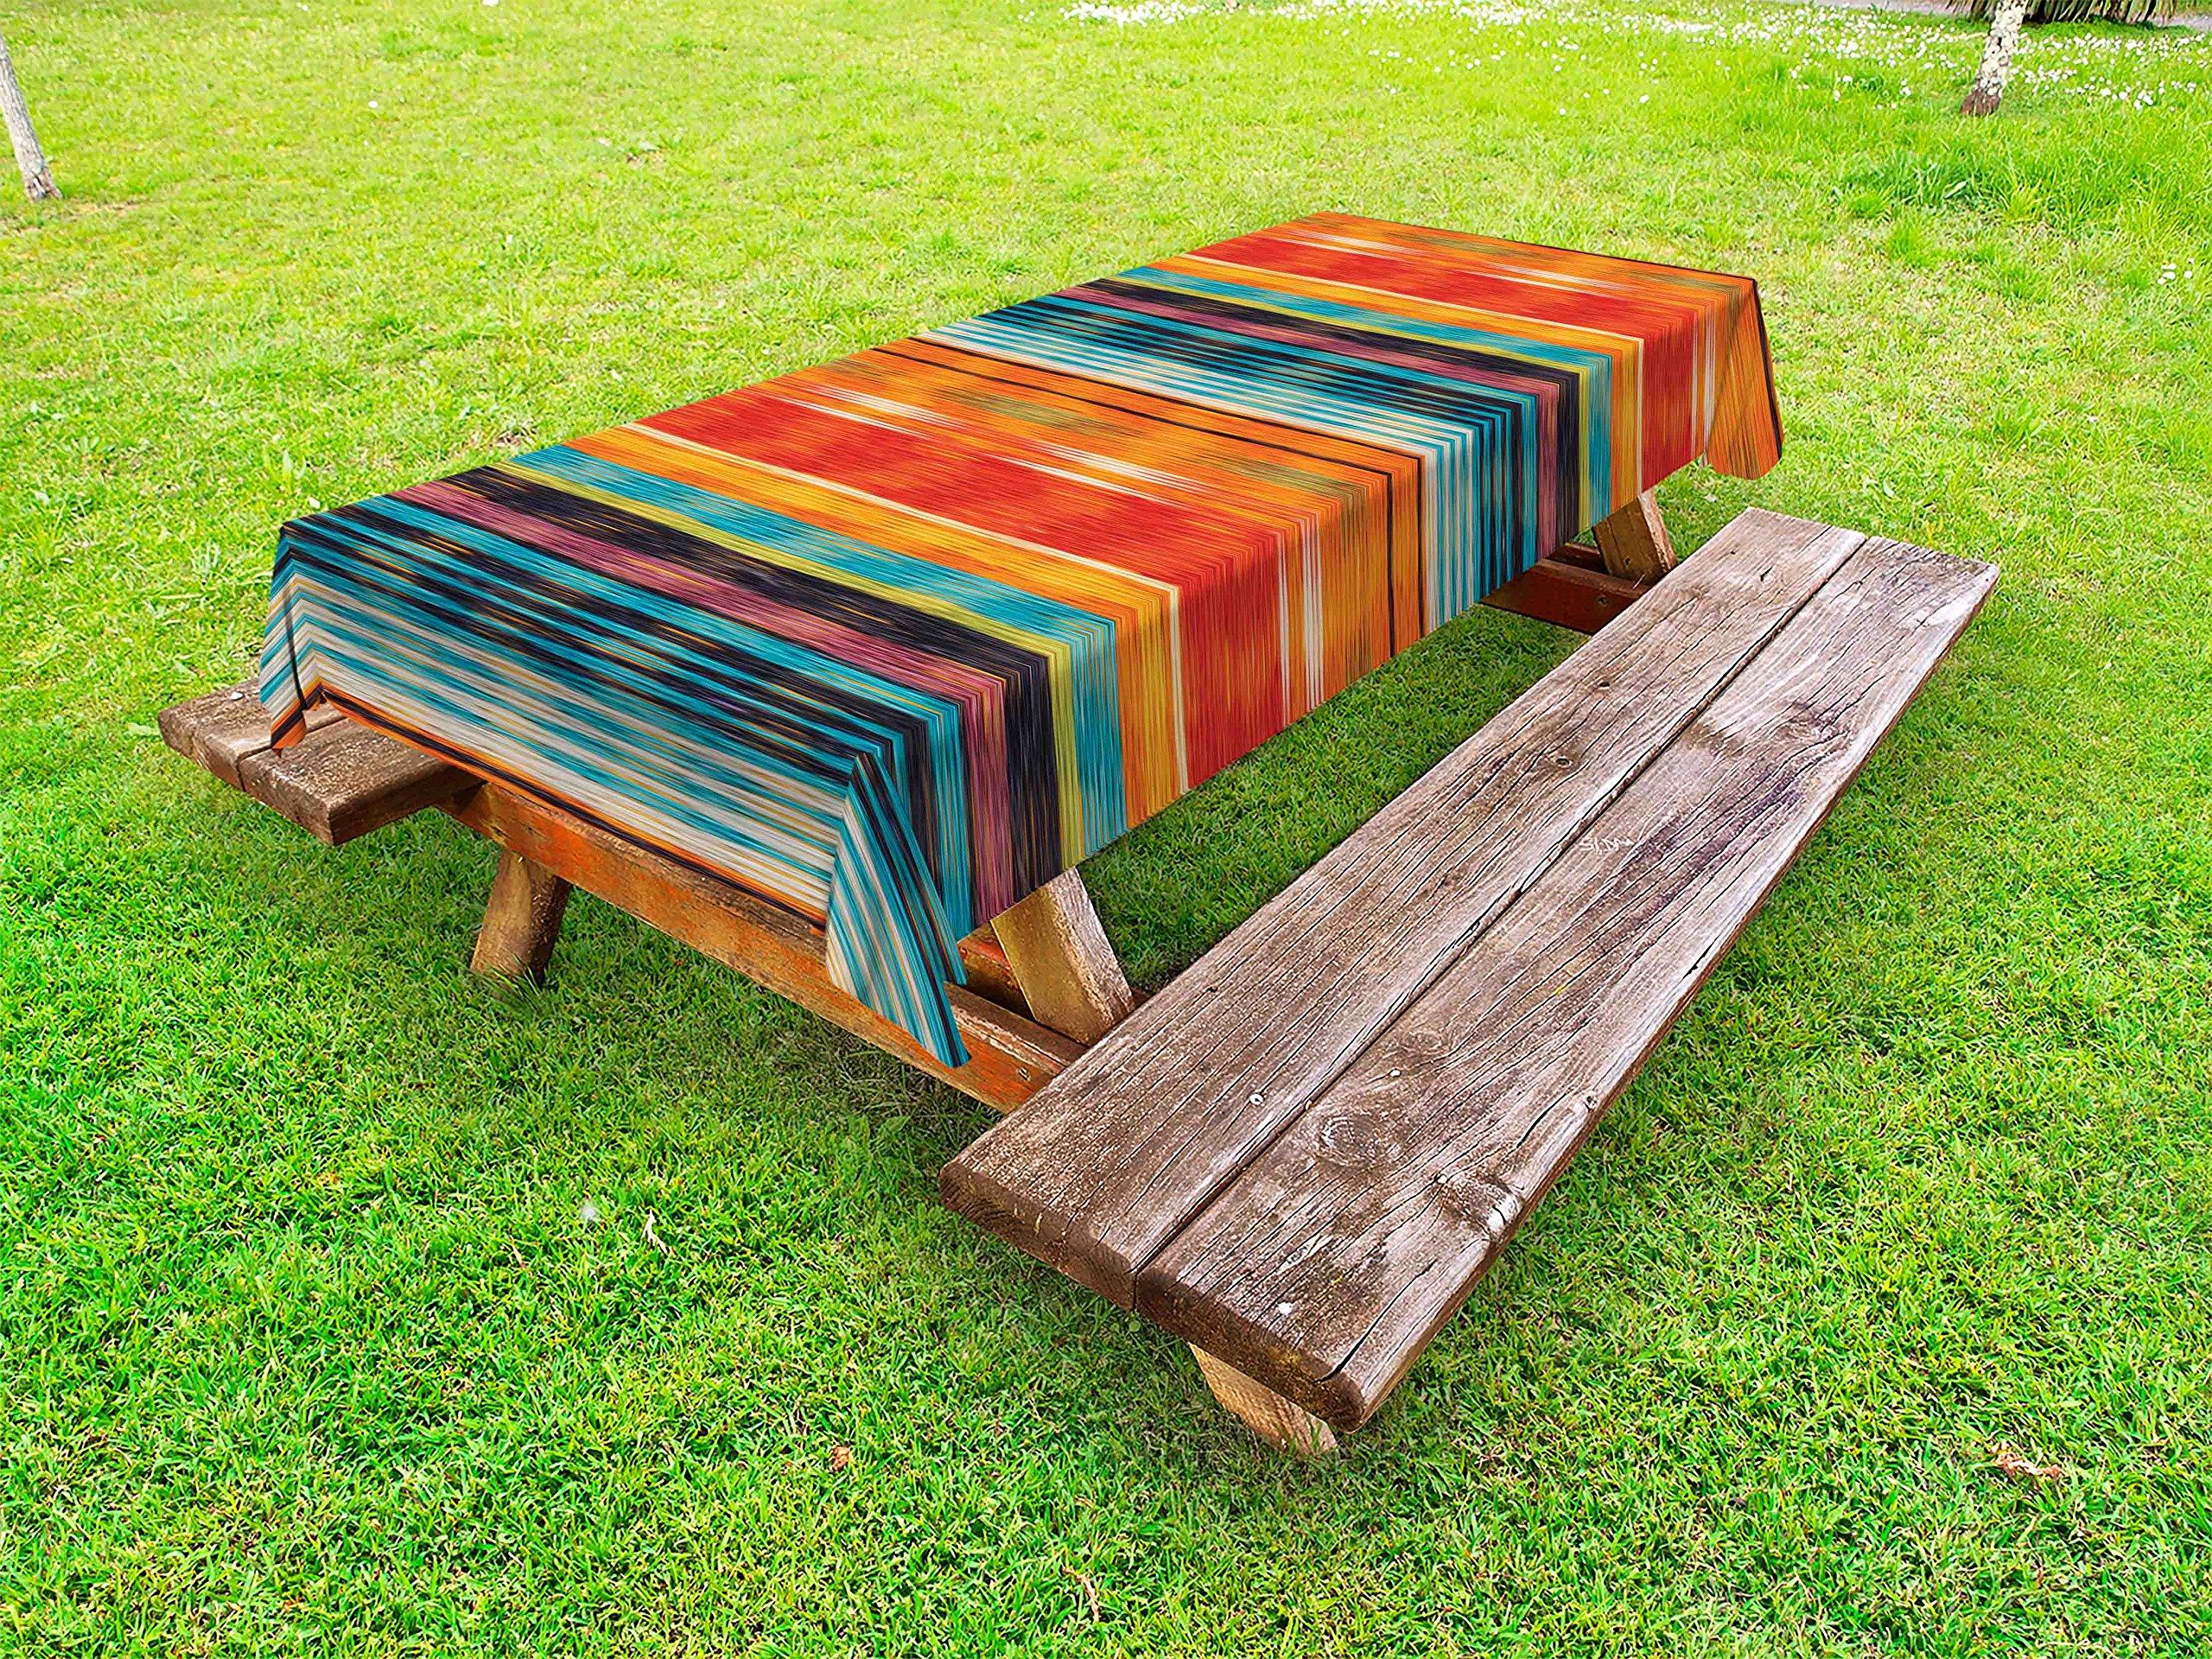 Lunarable Mexican Outdoor Tablecloth, Abstract Vibrant Vintage Aztec Motif Gradient Blurred Lines Ecuador Crafts Image, Decorative Washable Picnic Table Cloth, 58 X 104 inches, Multicolor